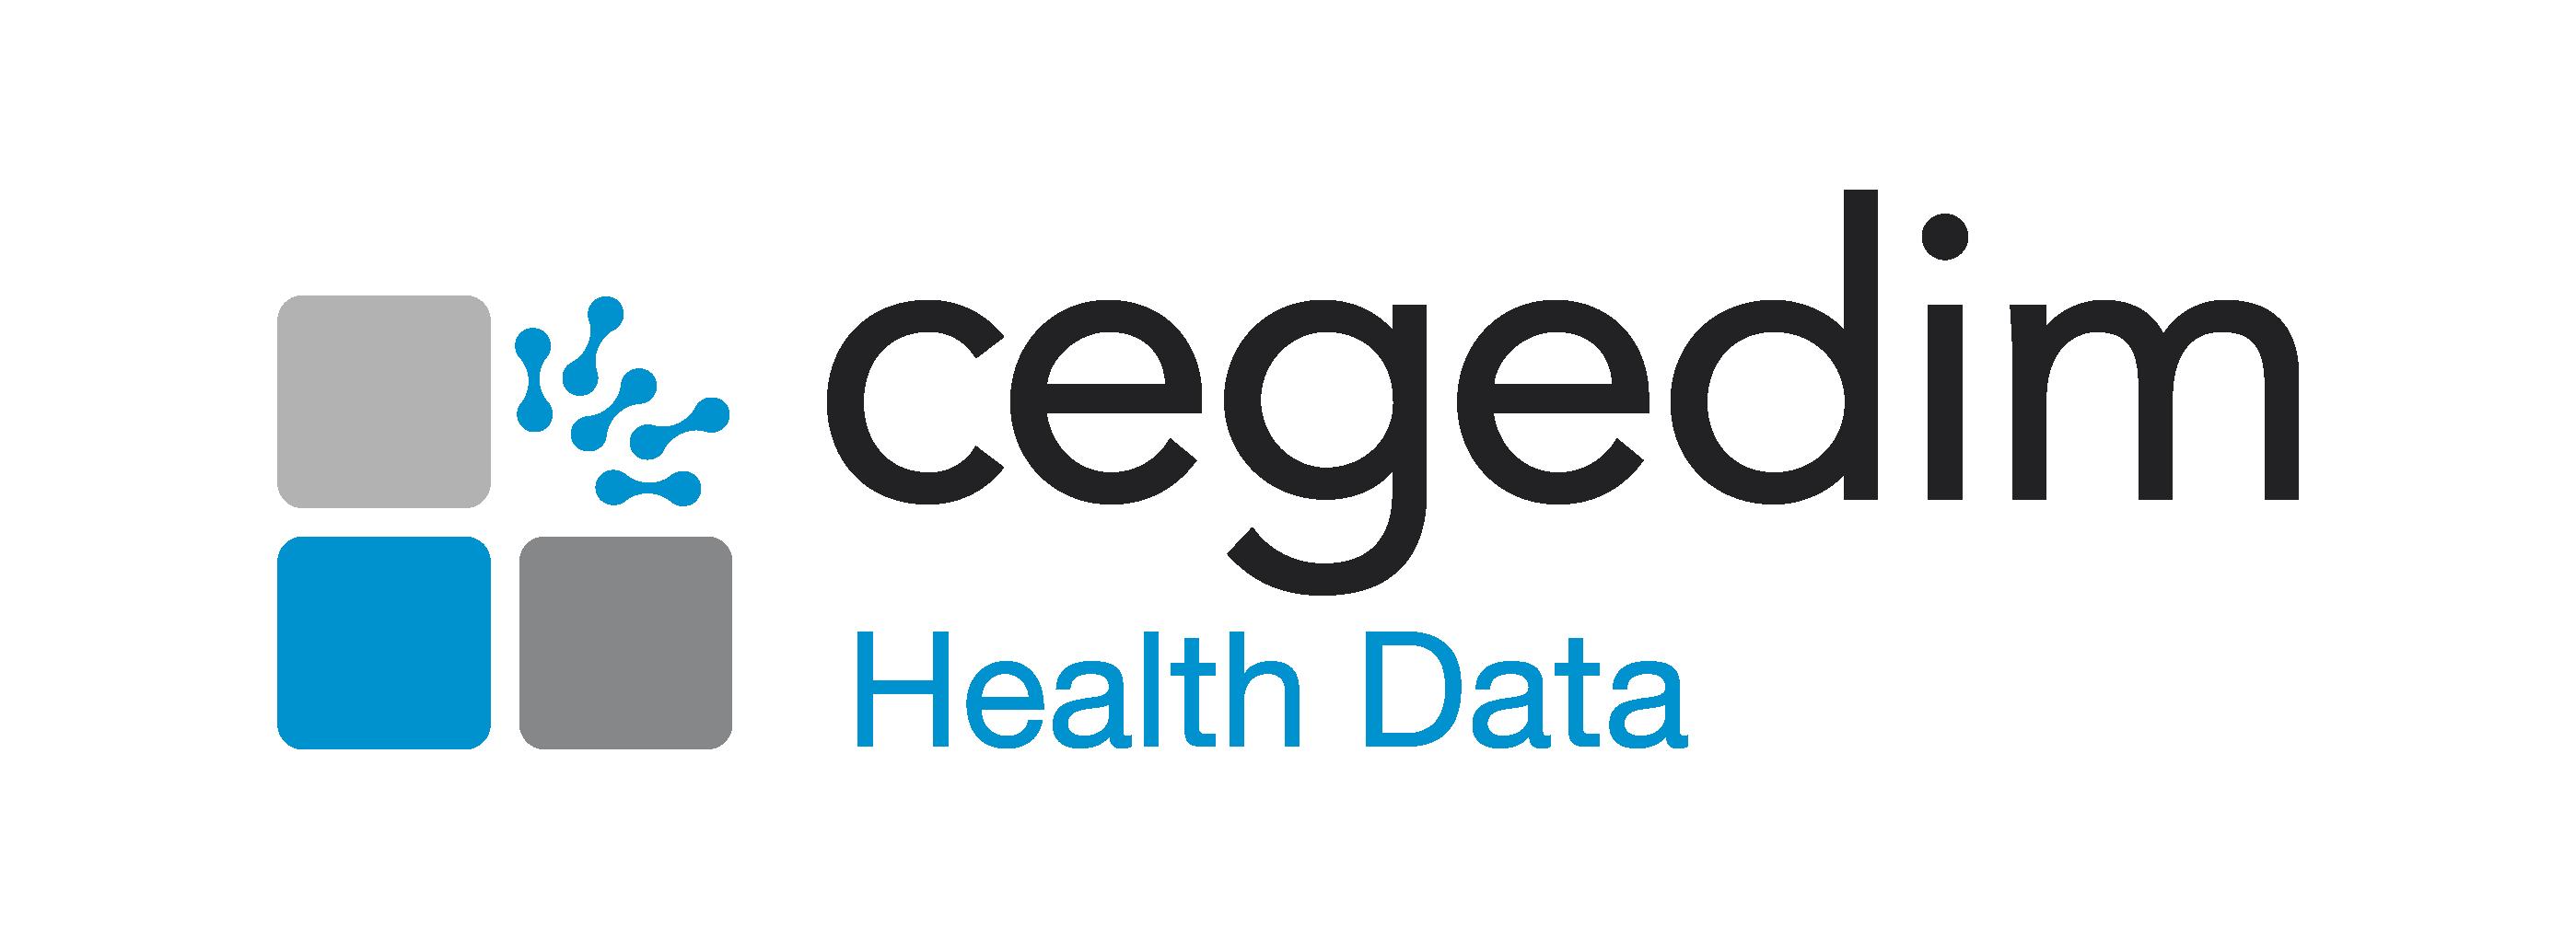 Cegedim Health Data Logo